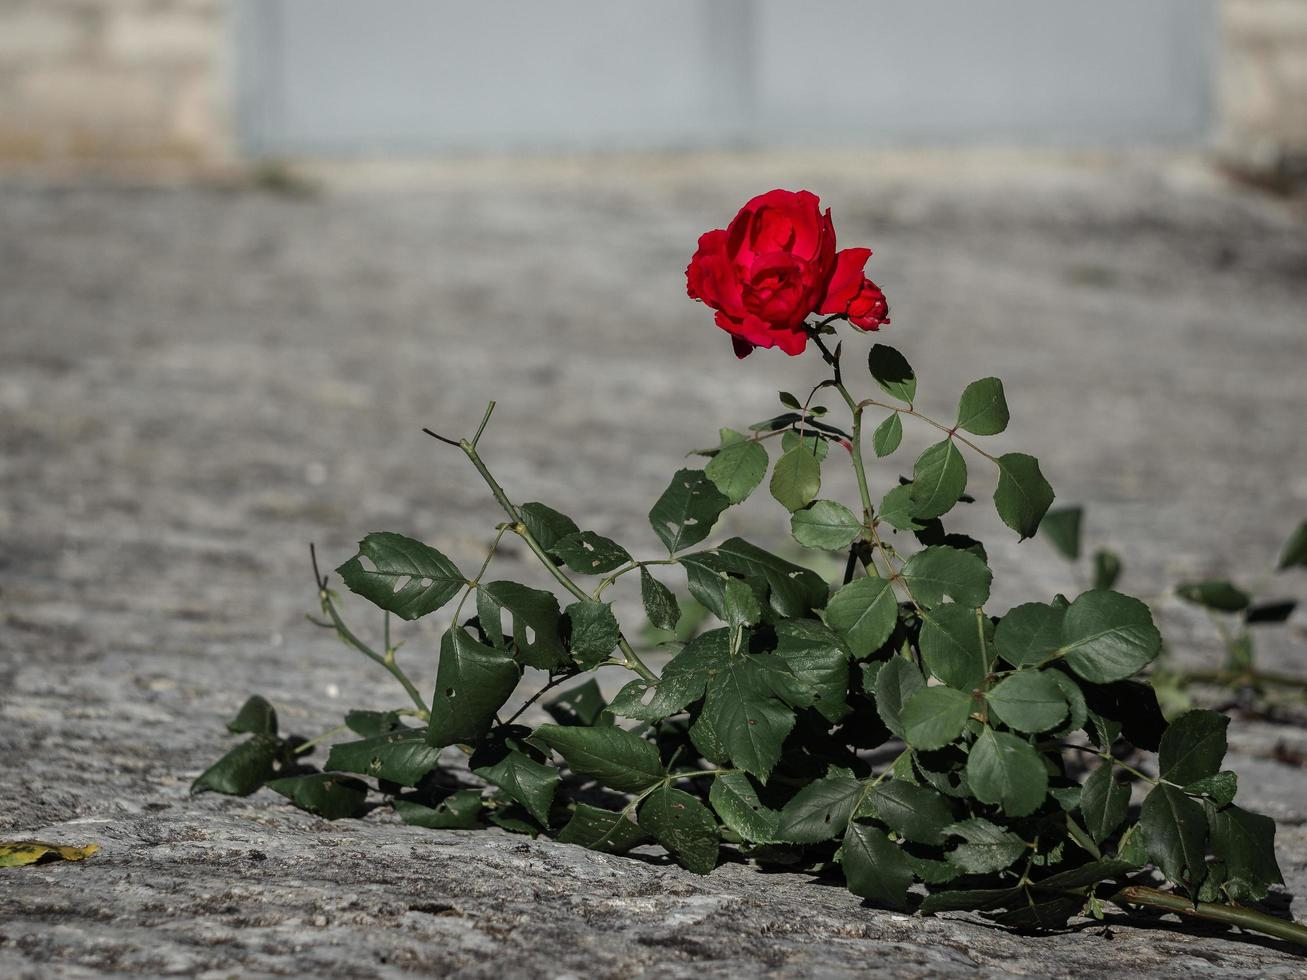 rote Rose auf dem Boden foto